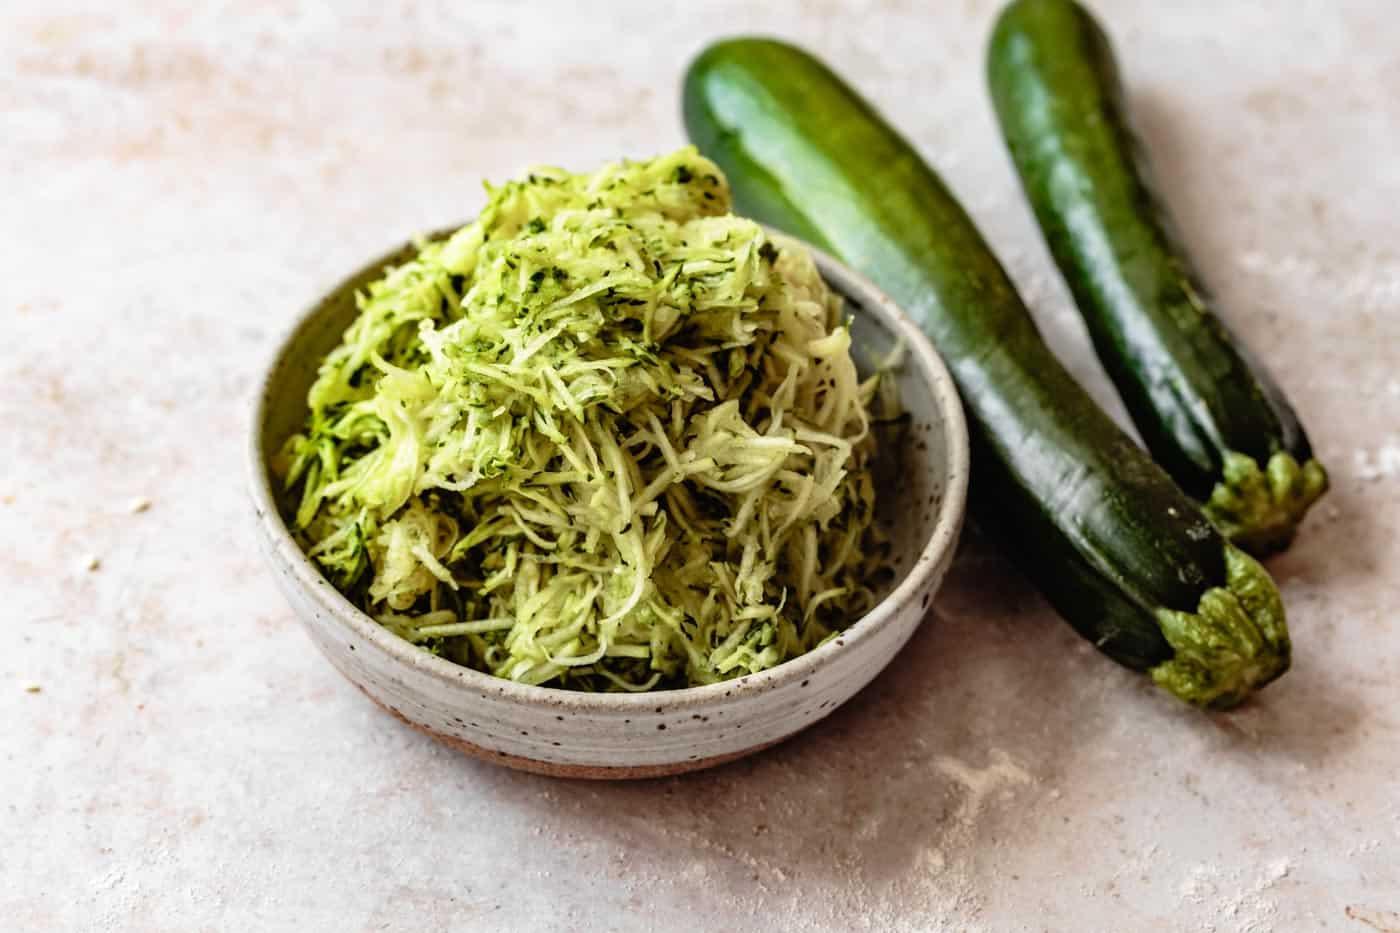 grated zucchini for vegan paleo zucchini bread